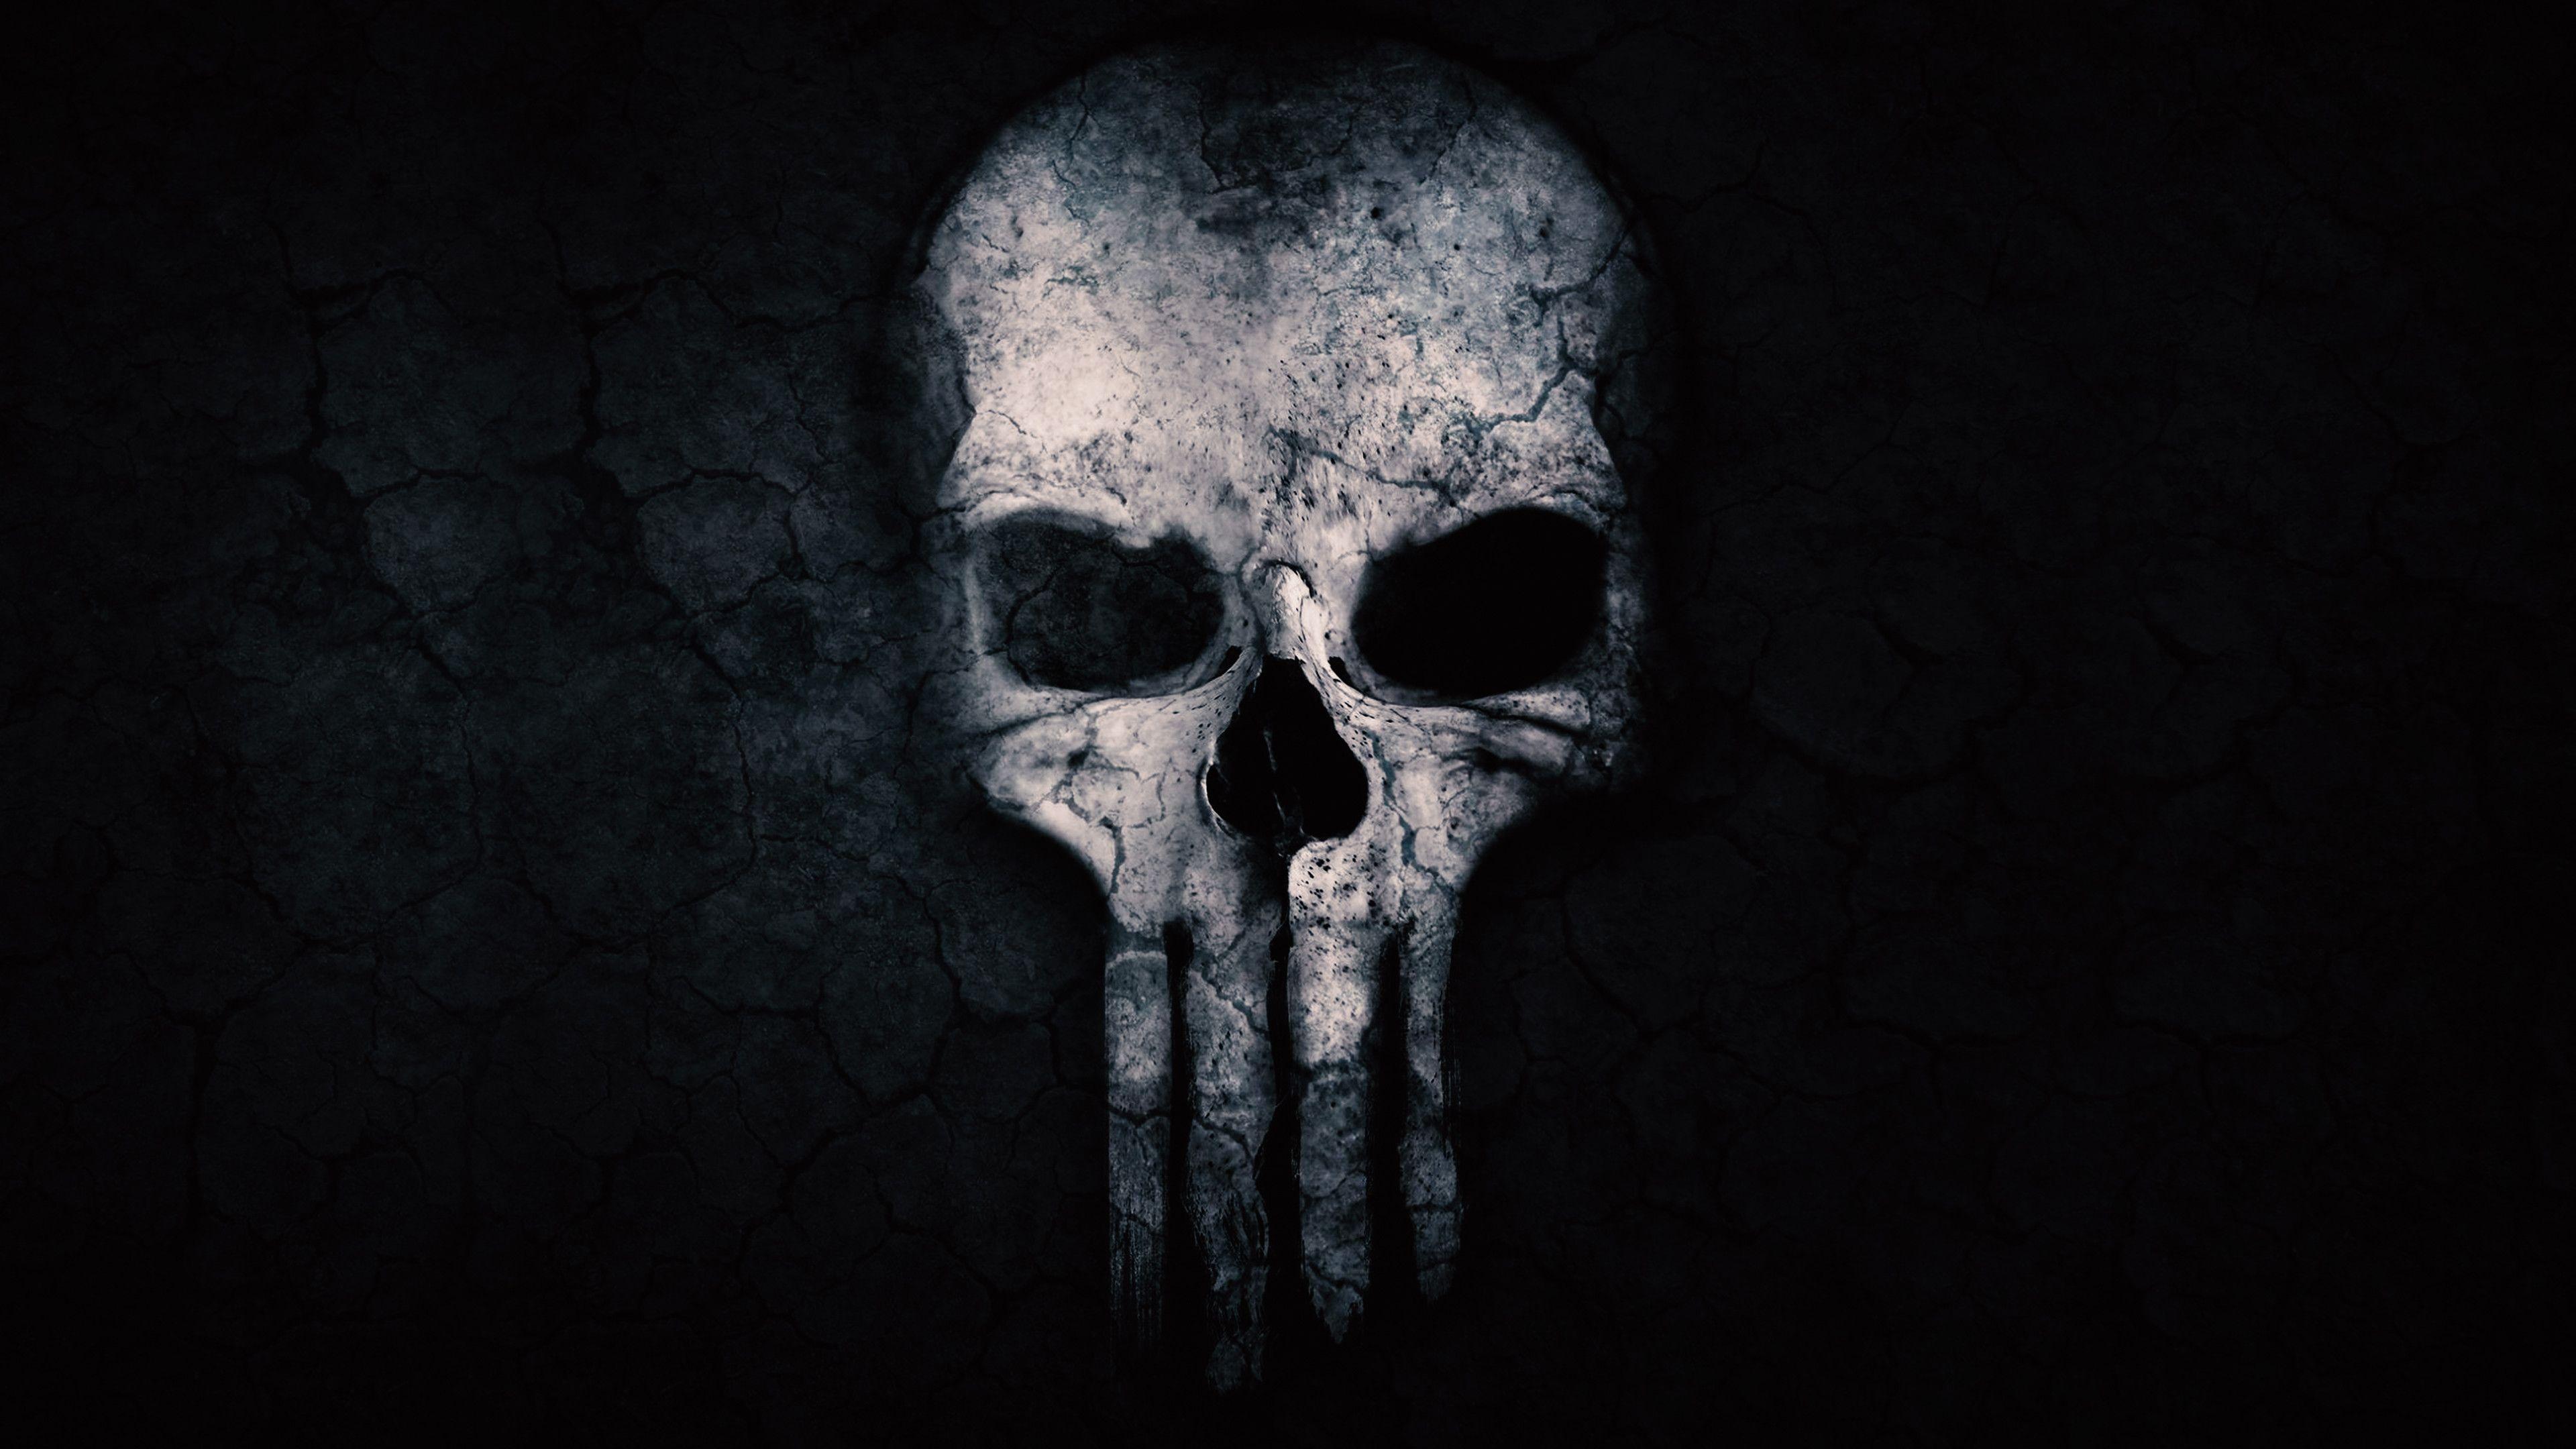 Cool Wallpaper Chromebook Mywallpapers Site Skull Wallpaper Google Themes Skull